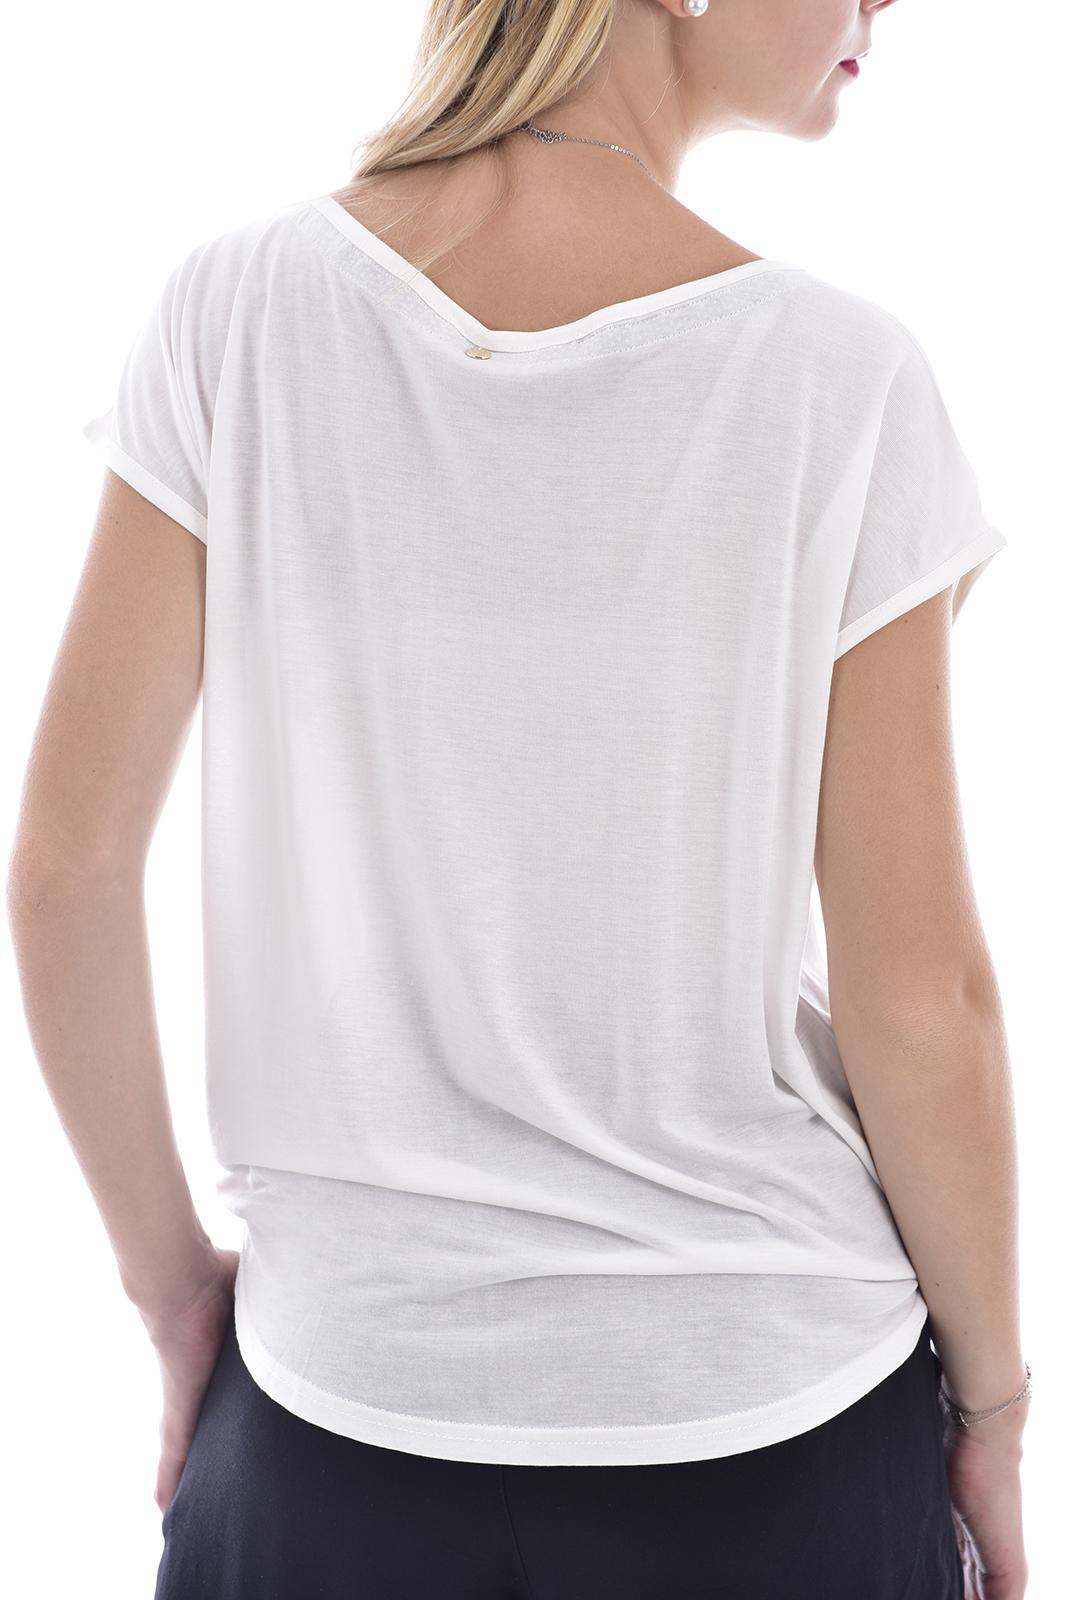 Tee shirt  Deeluxe LILI OFF WHITE